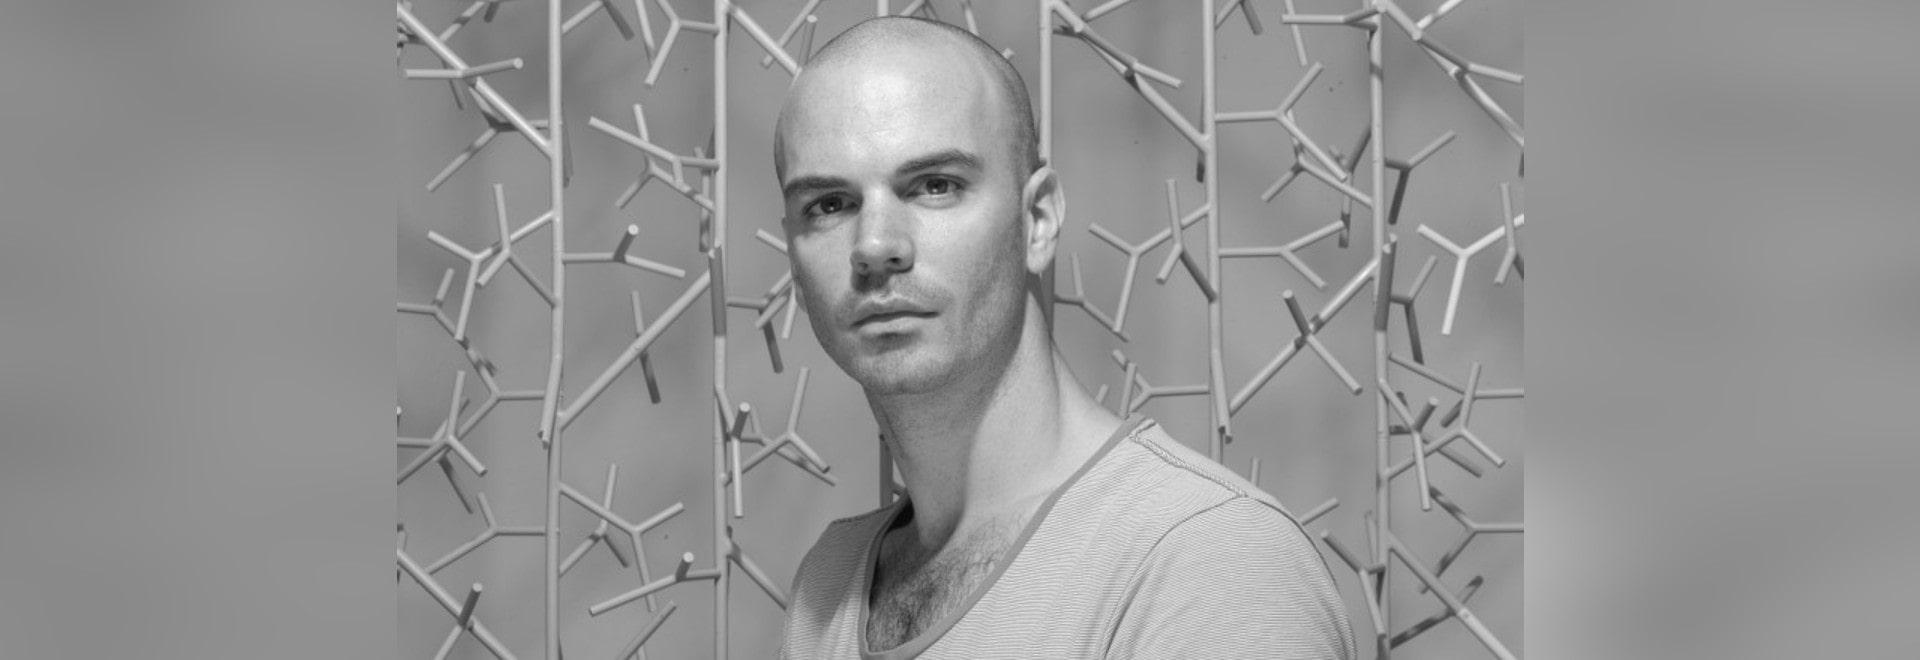 DESIGNER SPOTLIGHT: BENJAMIN HUBERT